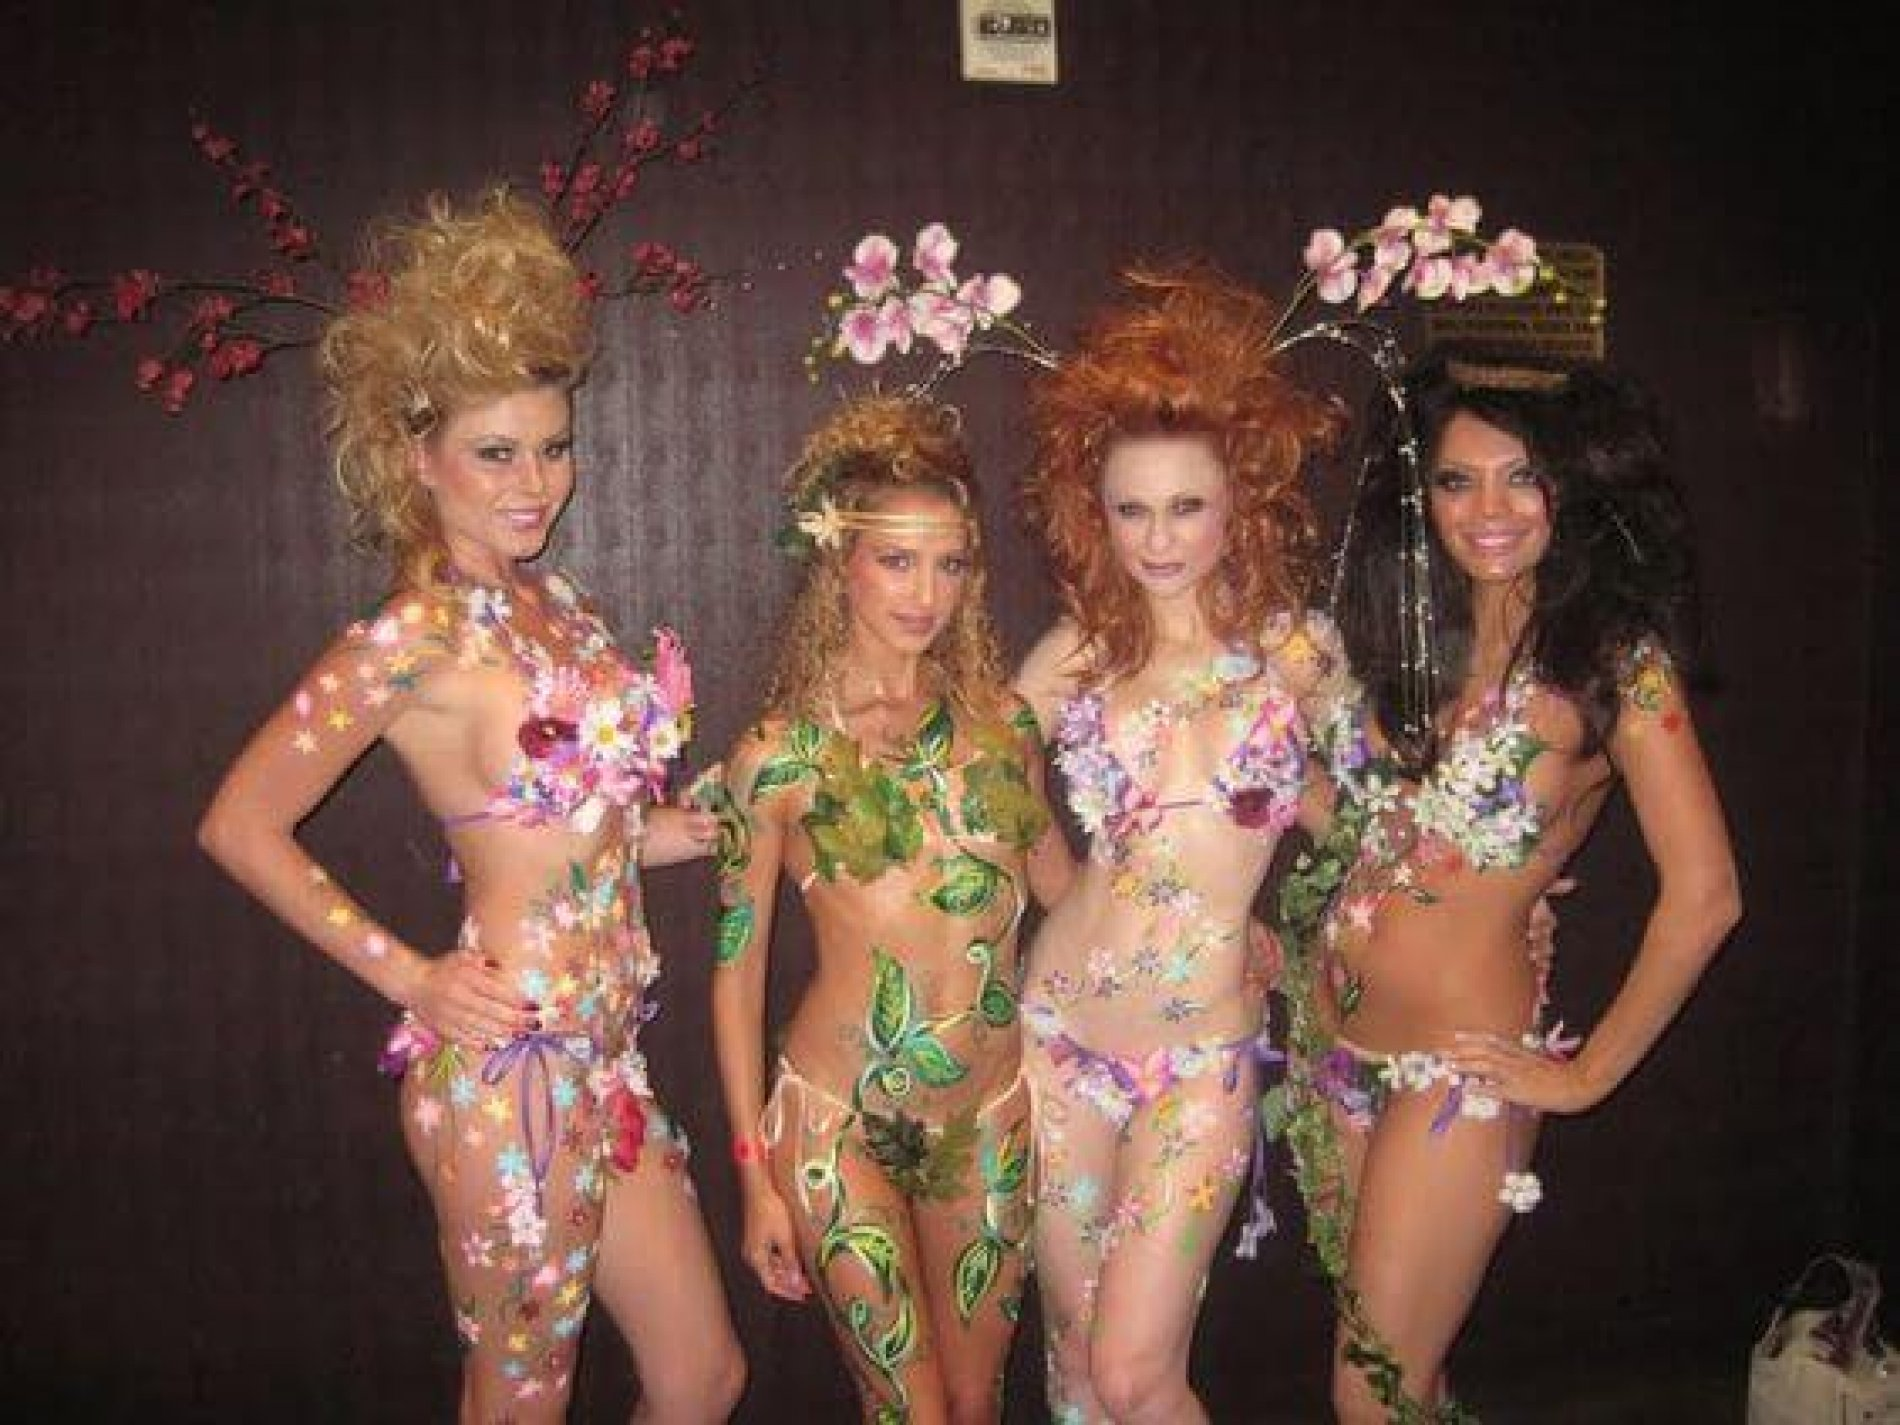 From LA to Las Vegas: A Midsummer Night's Dream 2016